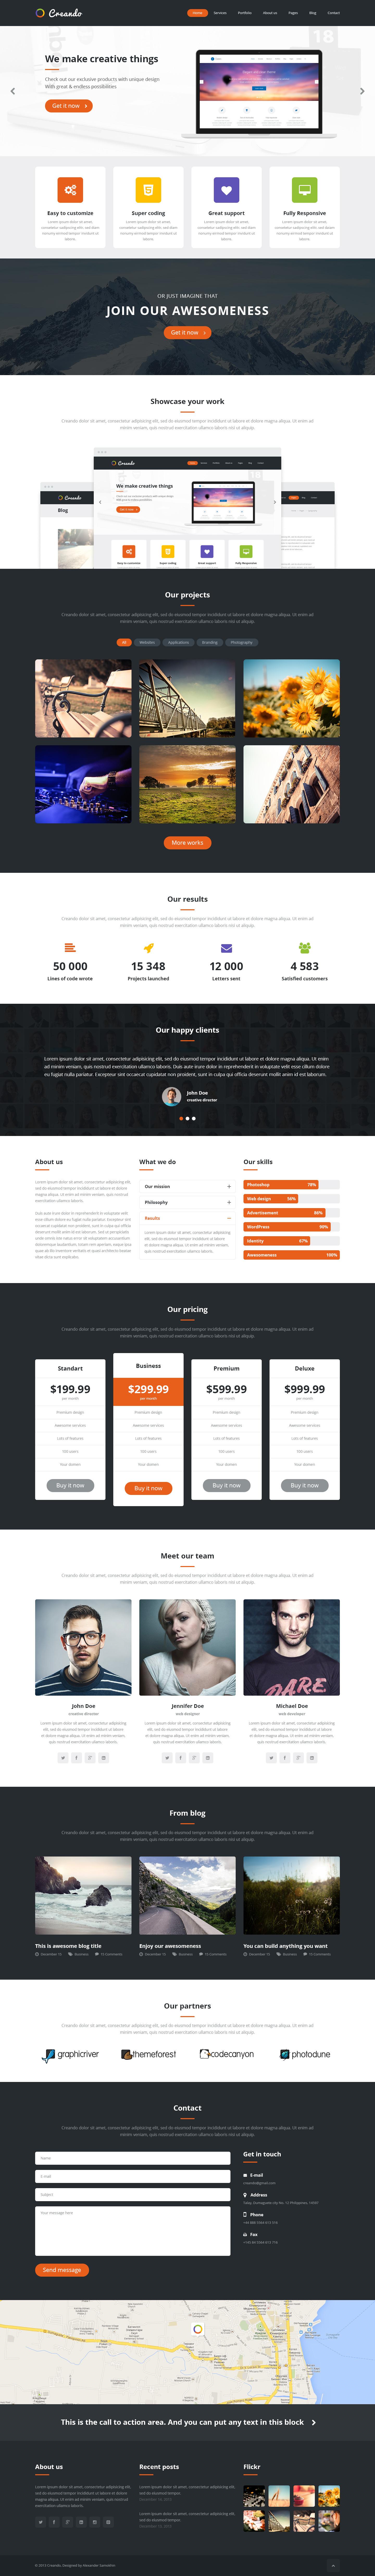 Creando – Creative Onepage Parallax PSD Template